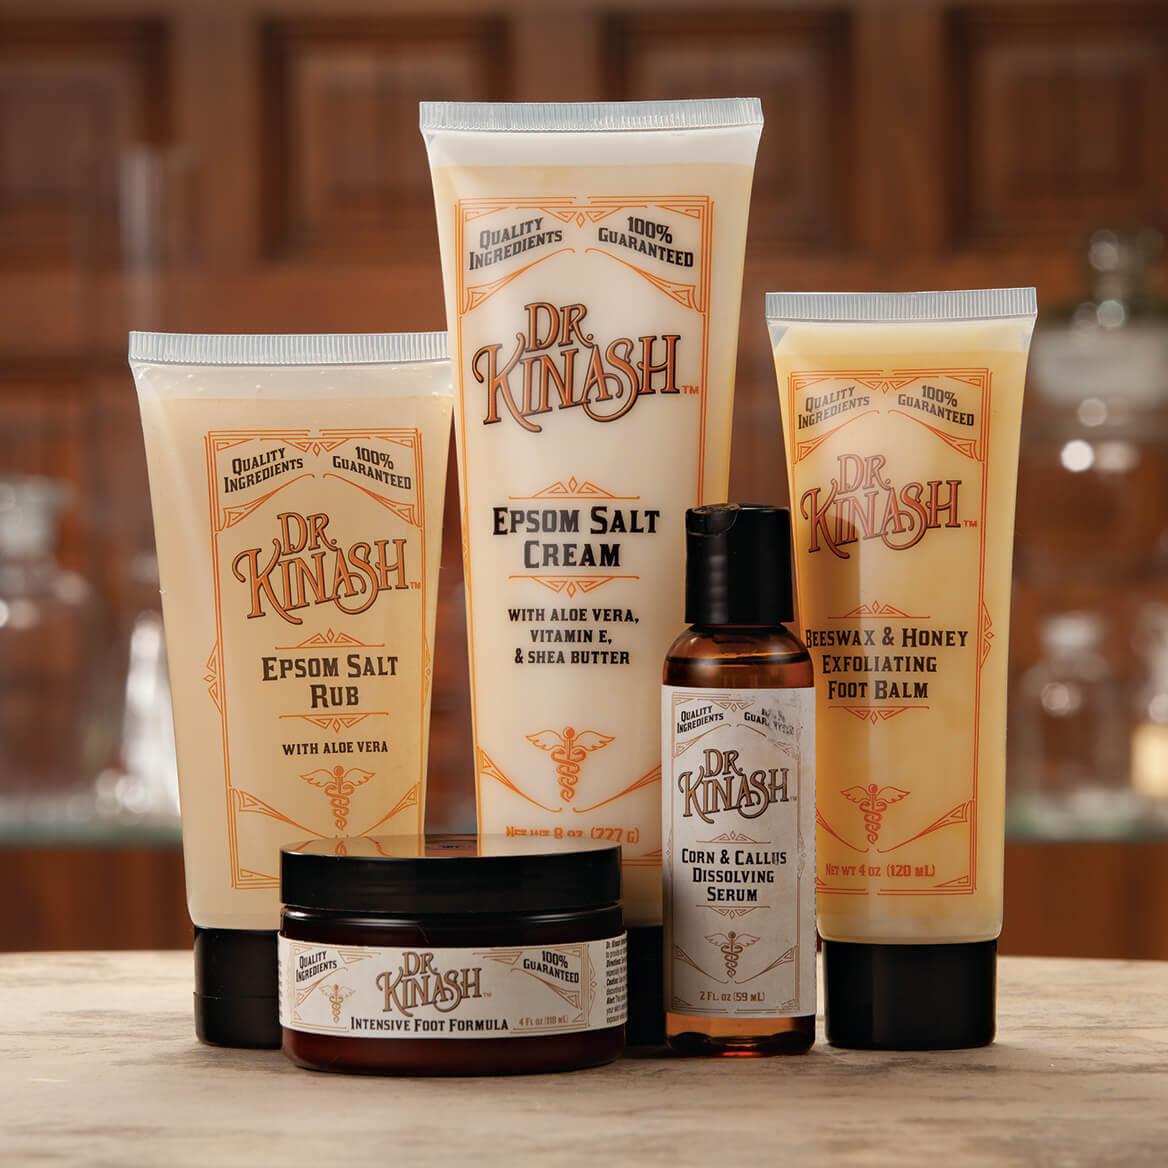 Dr. Kinash™ Beeswax & Honey Foot Balm, 4 oz.-360003